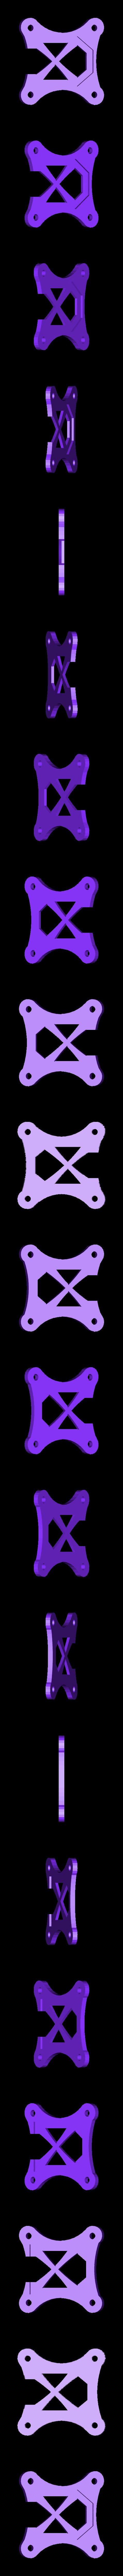 CADRE 30.5X30.5  FURIOUS MINI RX FRSKY PART02 .stl Download free STL file Furious Mini RX FRSKY Adapter Receiver + Buzzer 9mm • 3D printing object, Microdure